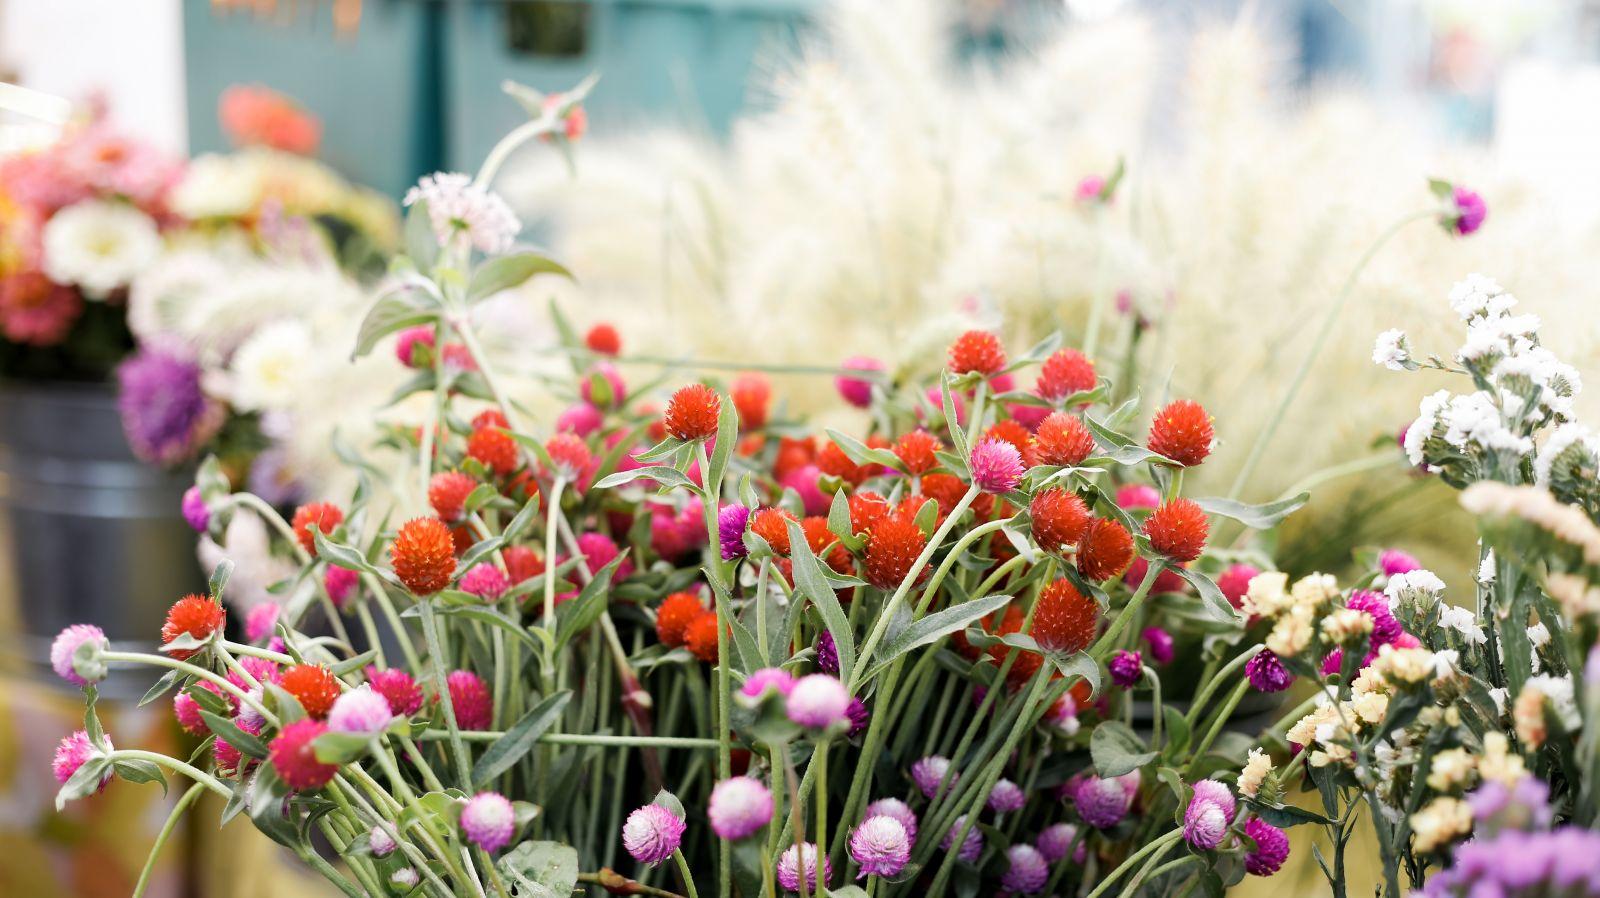 Flowers at Sarasota farmer's market